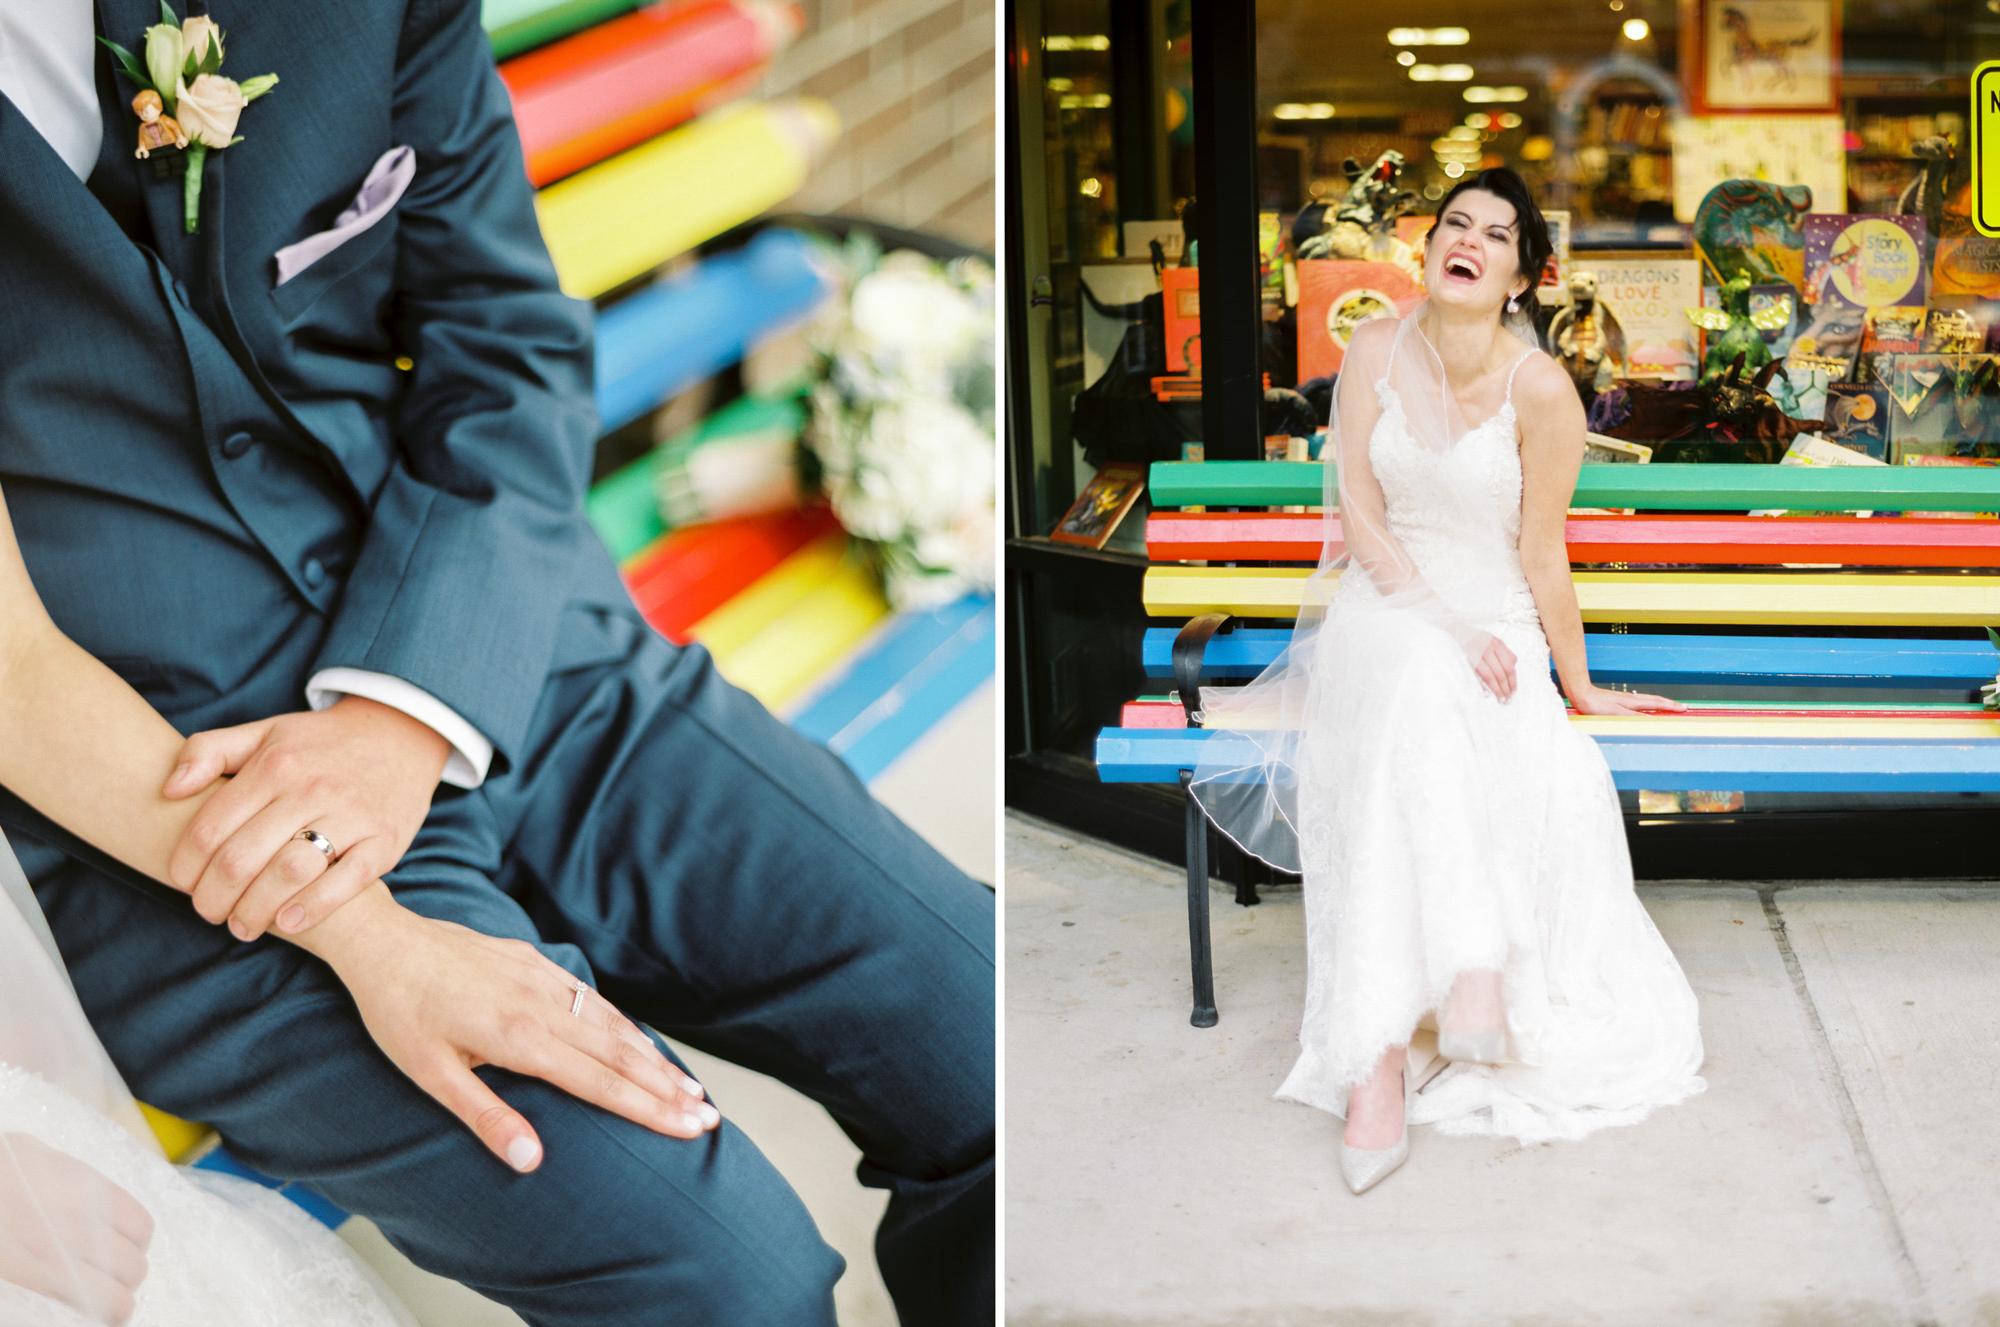 saratoga-springs-national-dance-eclectic-downtown-charlotte-film-wedding-photographer-carousel-24.jpg